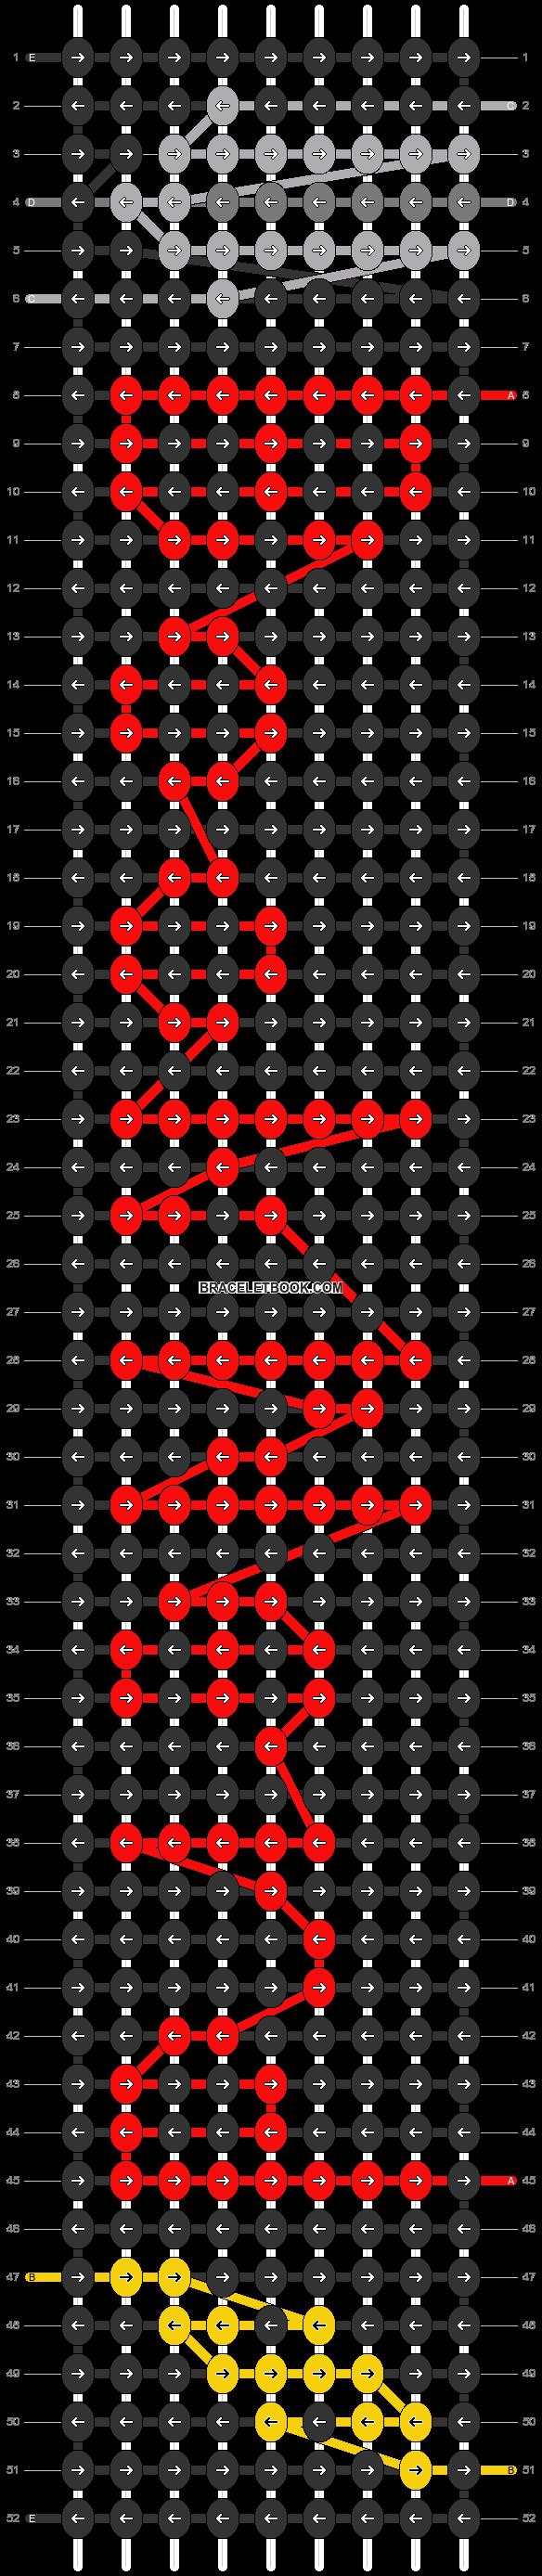 Alpha pattern #74439 pattern